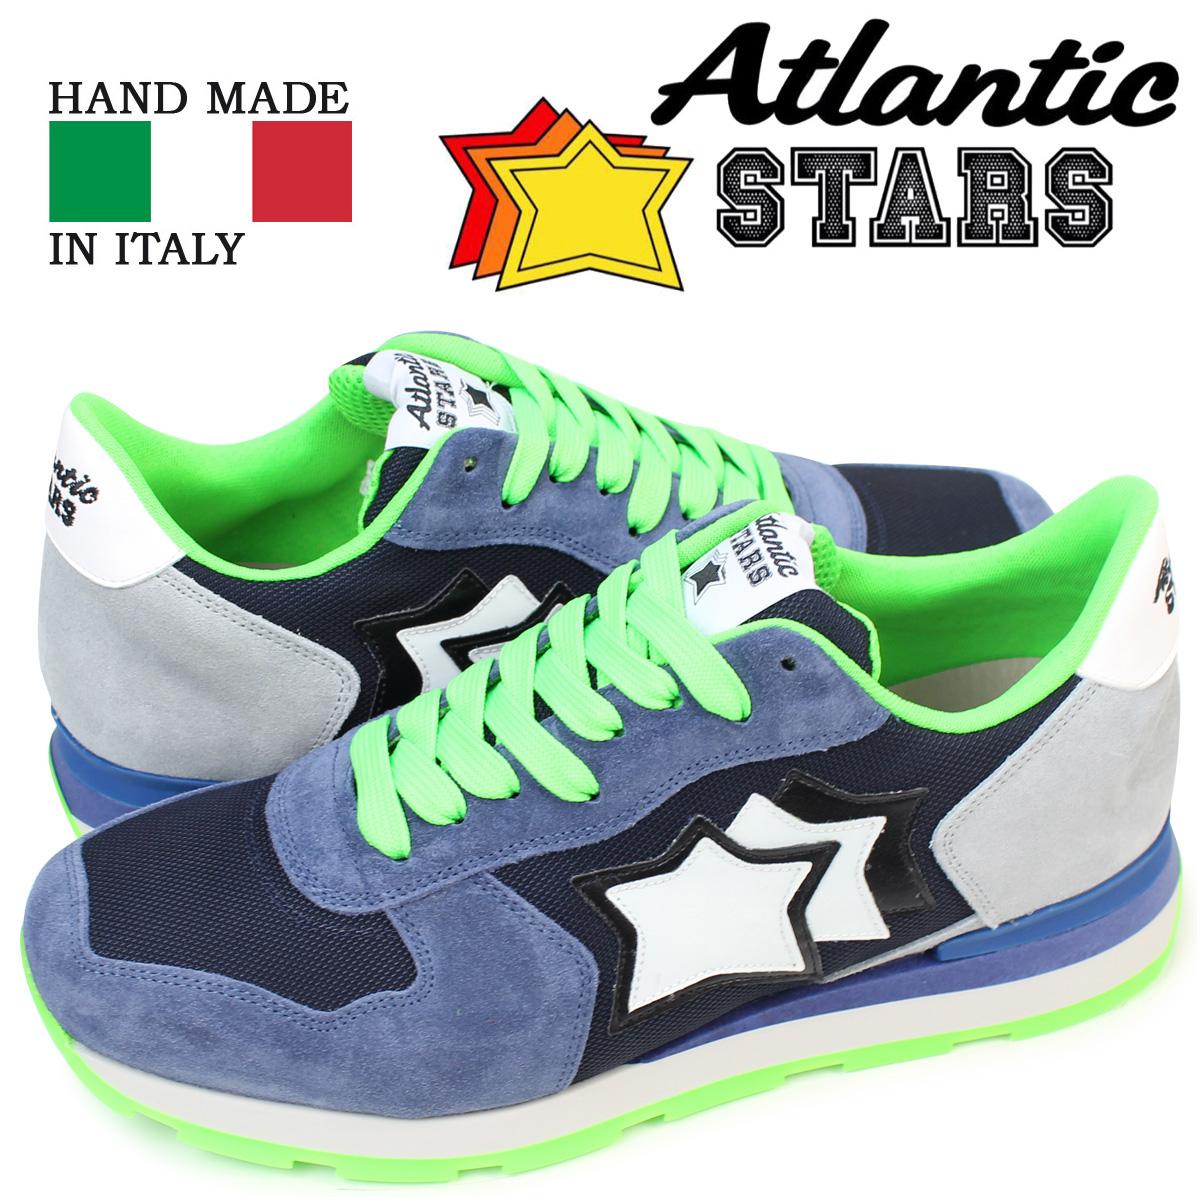 Atlantic STARS メンズ スニーカー アトランティックスターズ アンタレス ANTARES IAN-87A 靴 ネイビー グレー